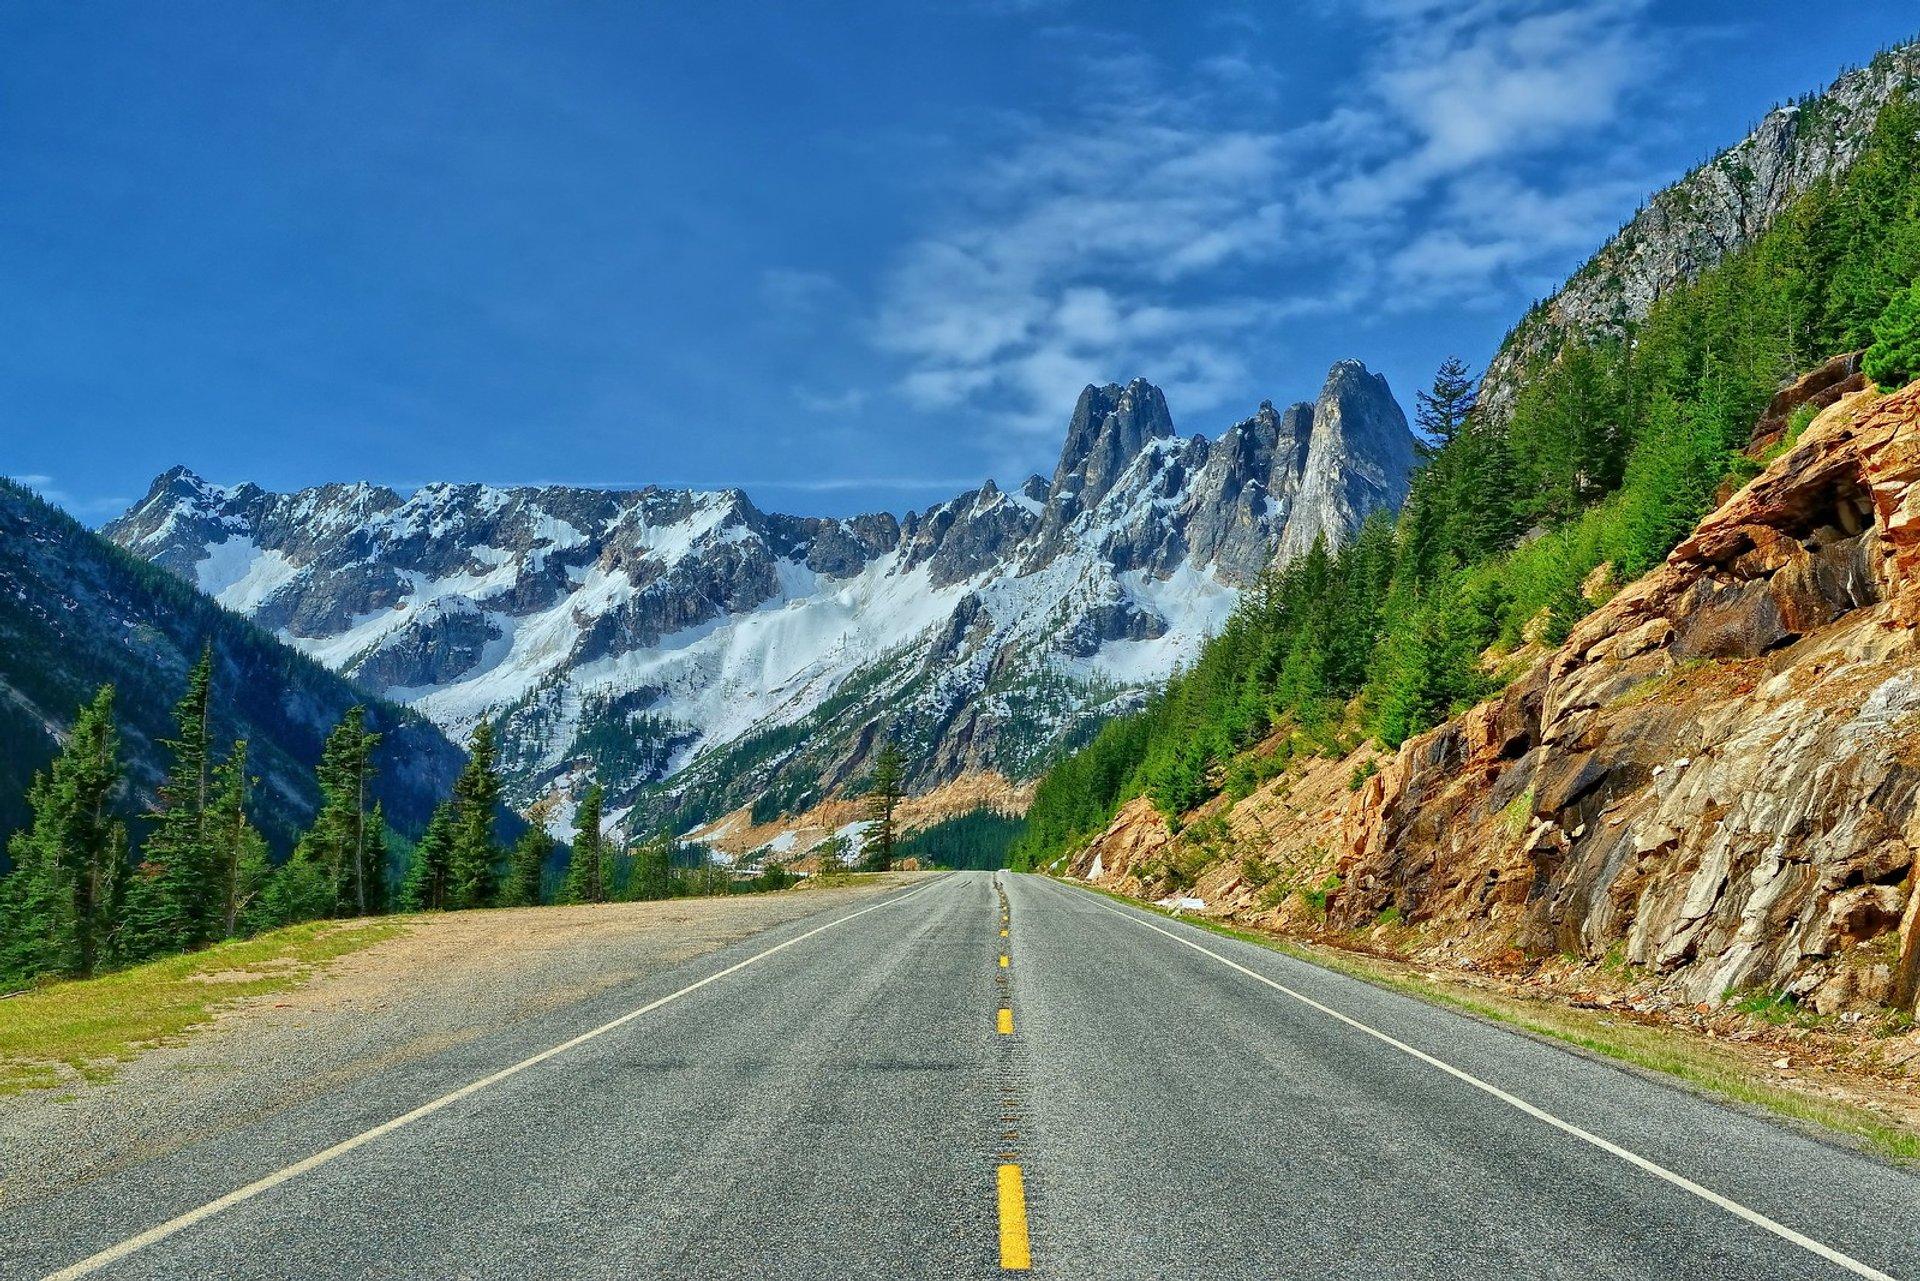 North Cascades Highway in Washington 2019 - Best Time